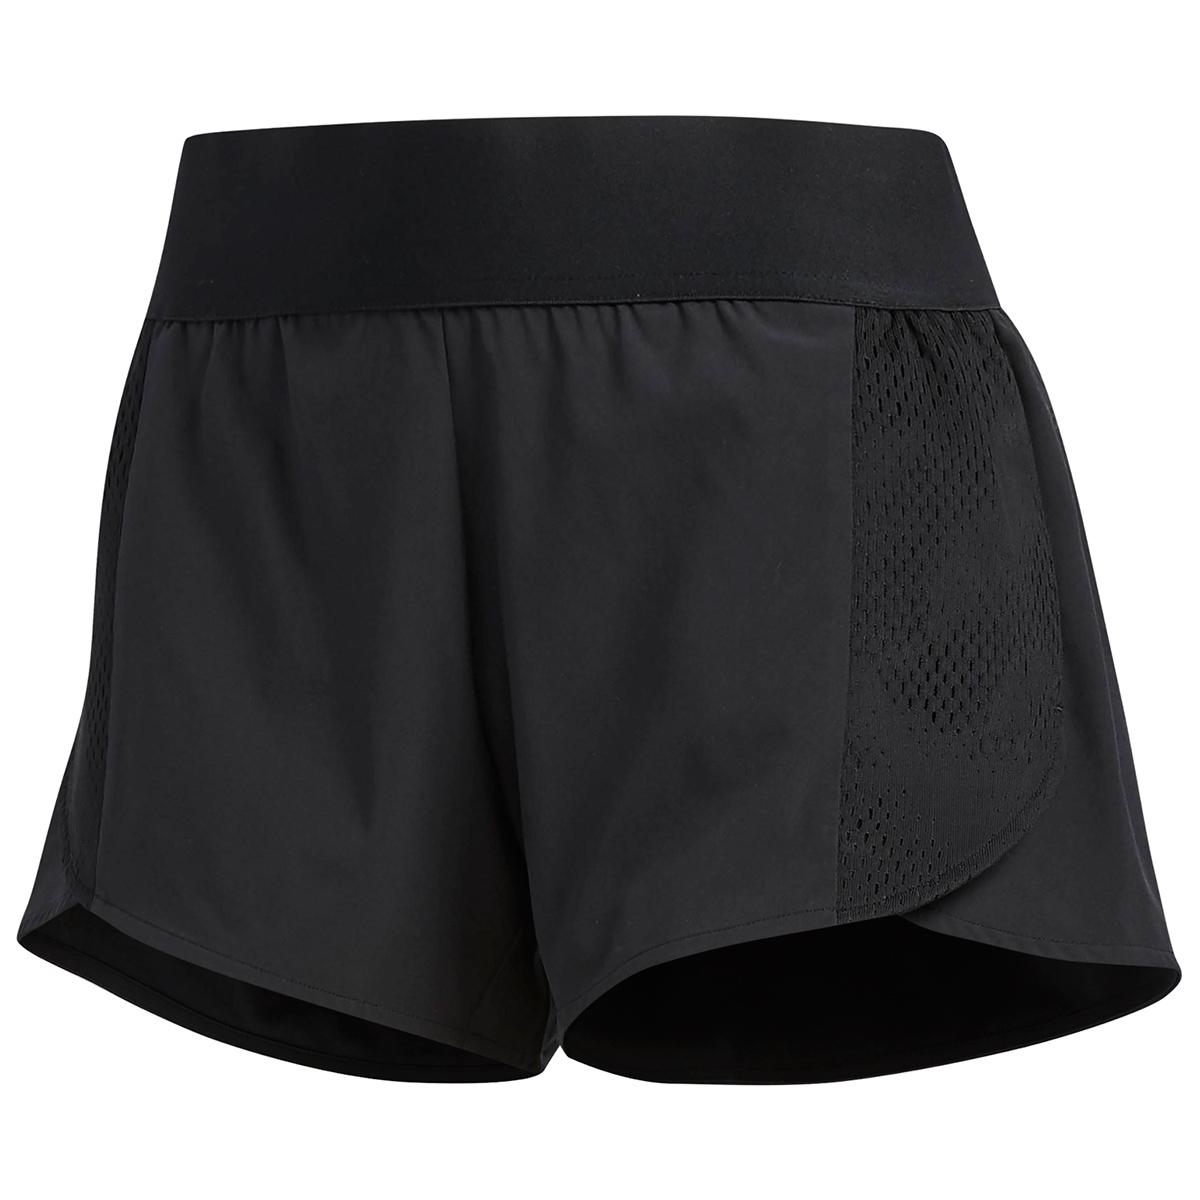 Adidas Women's Sport Id Woven Mesh Shorts - Black, S